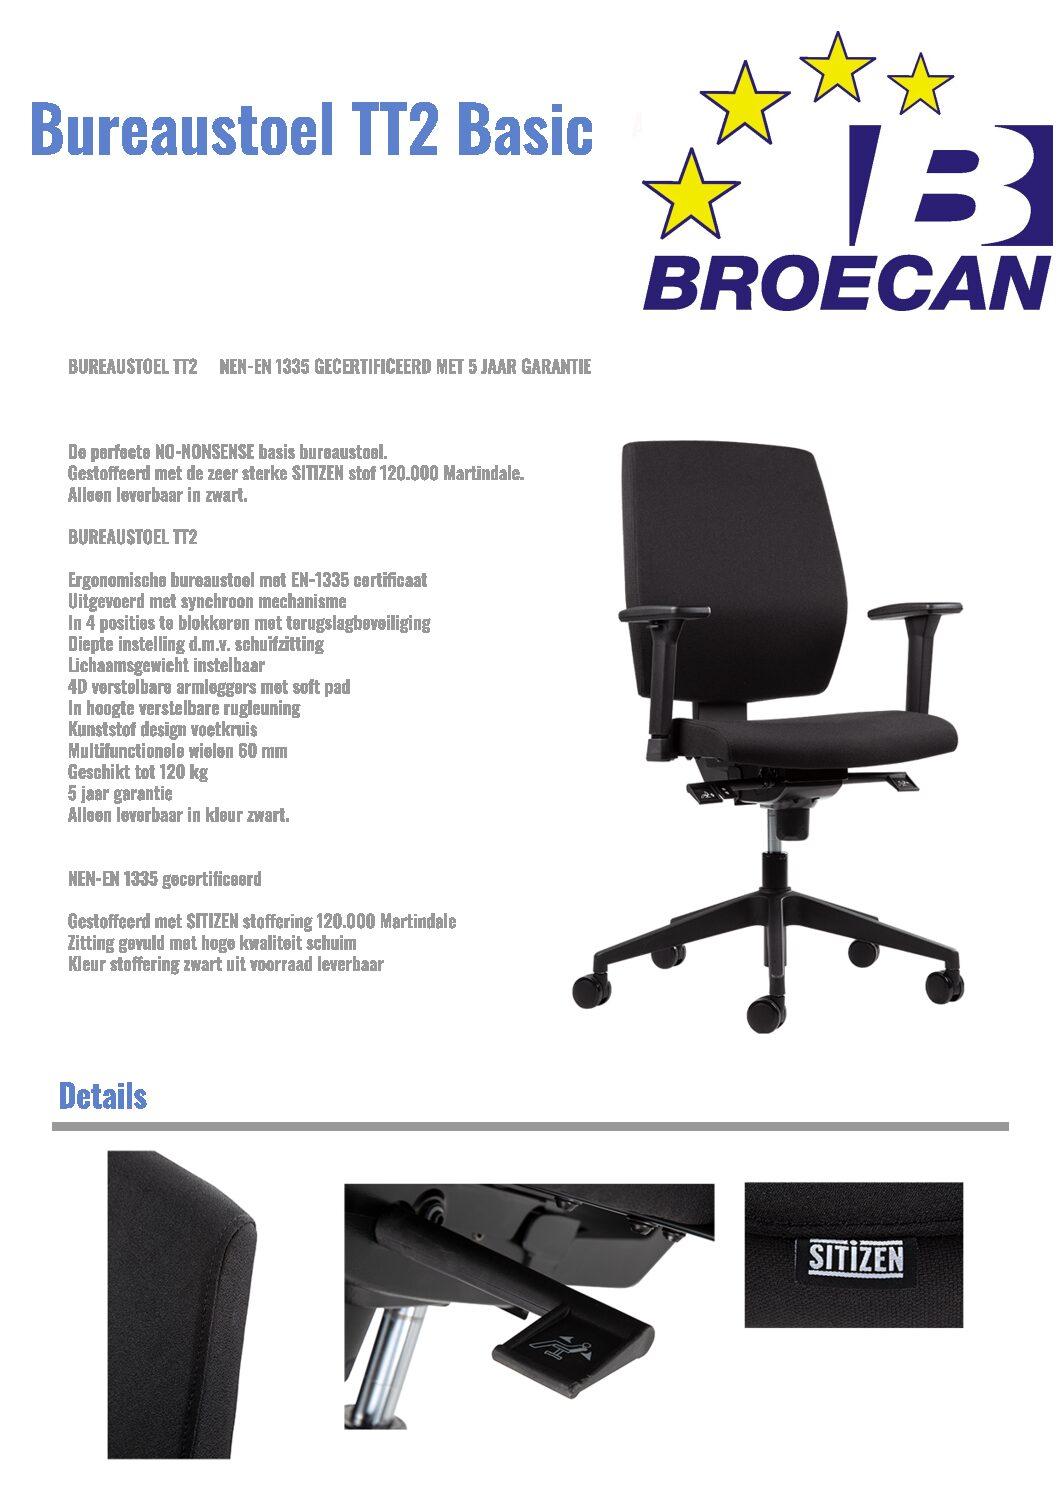 OKA Bureautafel 180×80, Q50 HV inkl. nieuwe Bureaustoel Eur 399,00 inkl.BTW